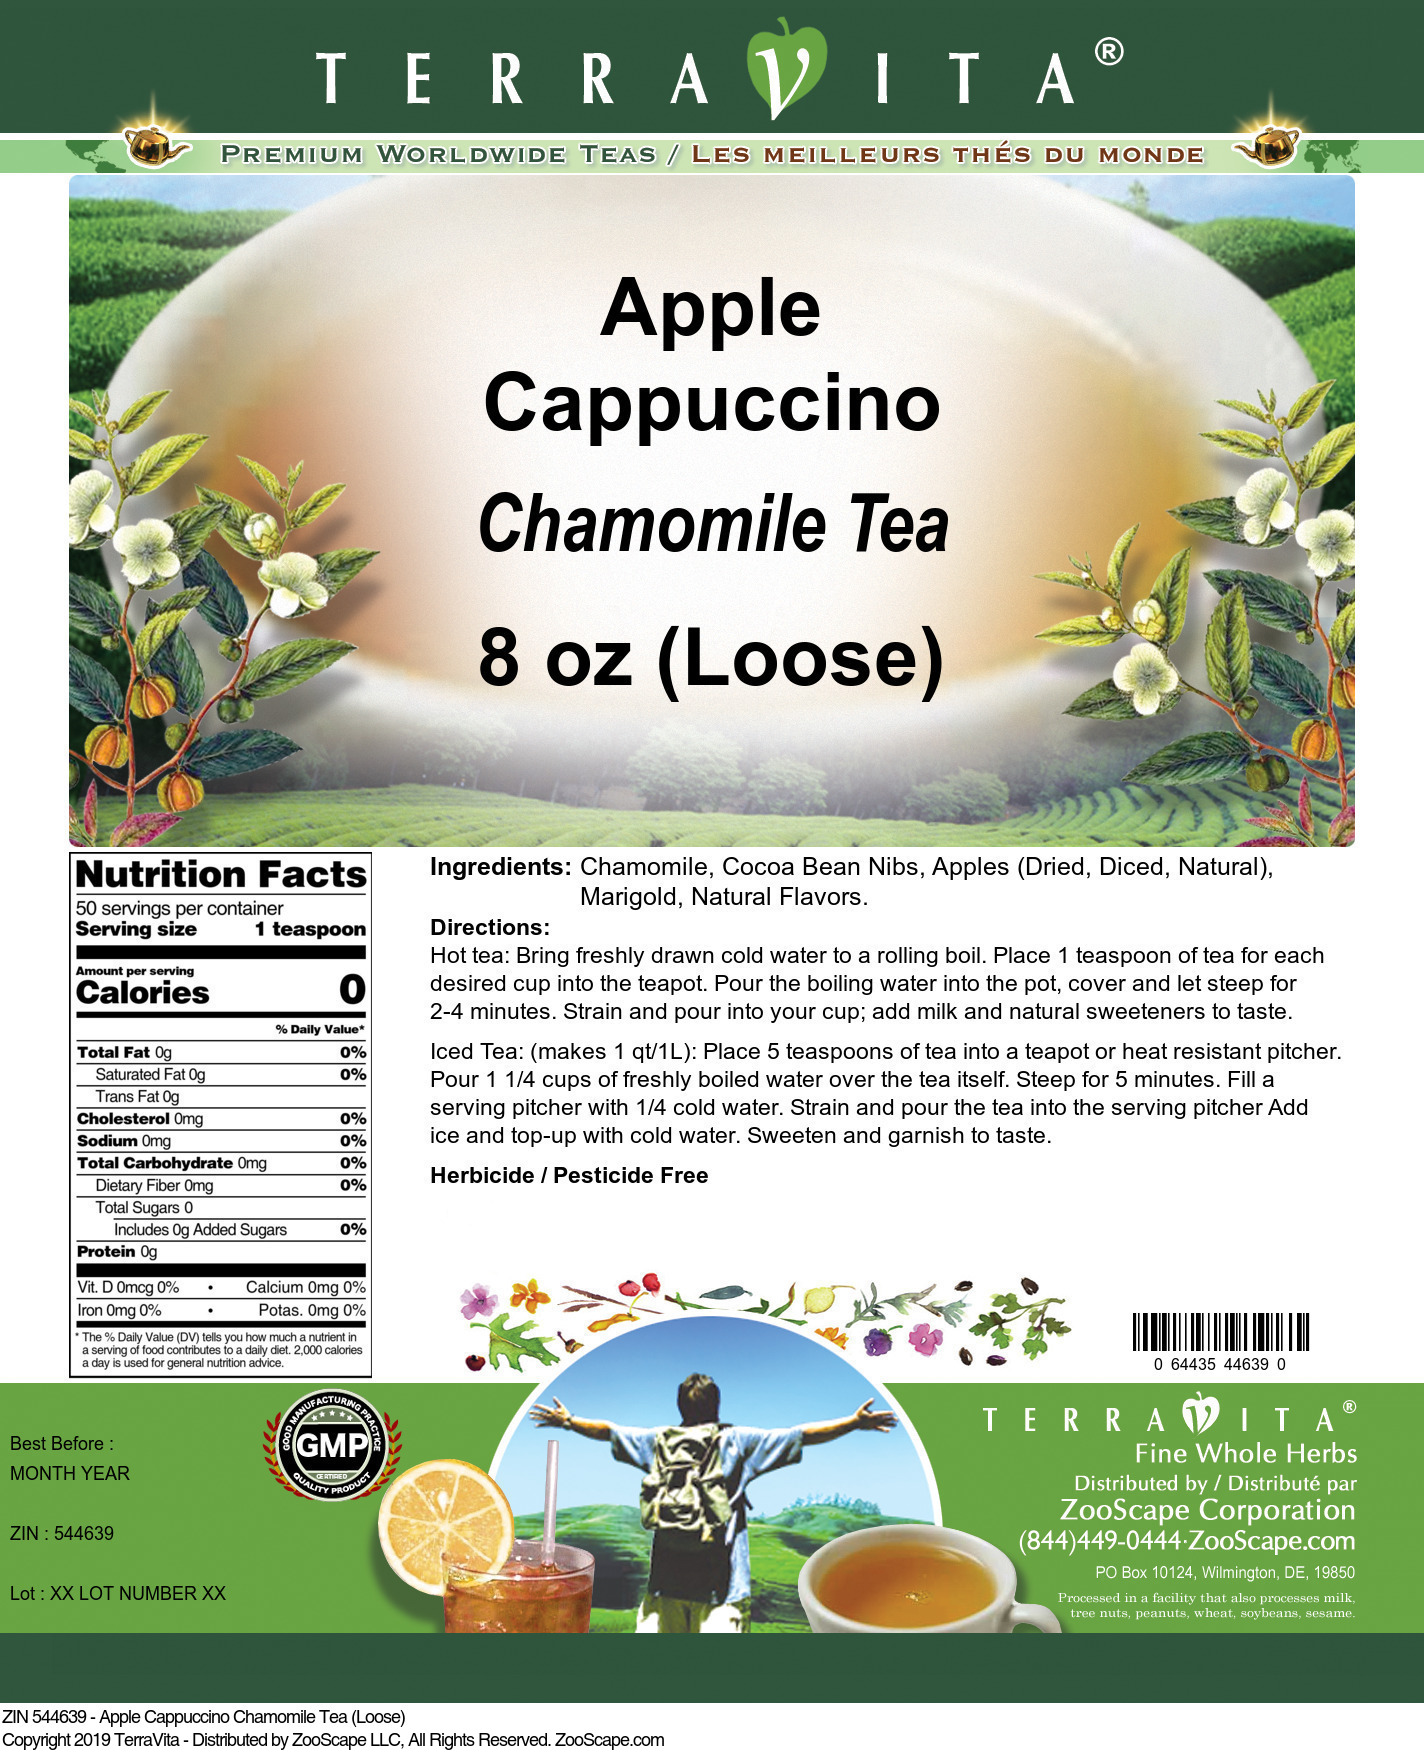 Apple Cappuccino Chamomile Tea (Loose)